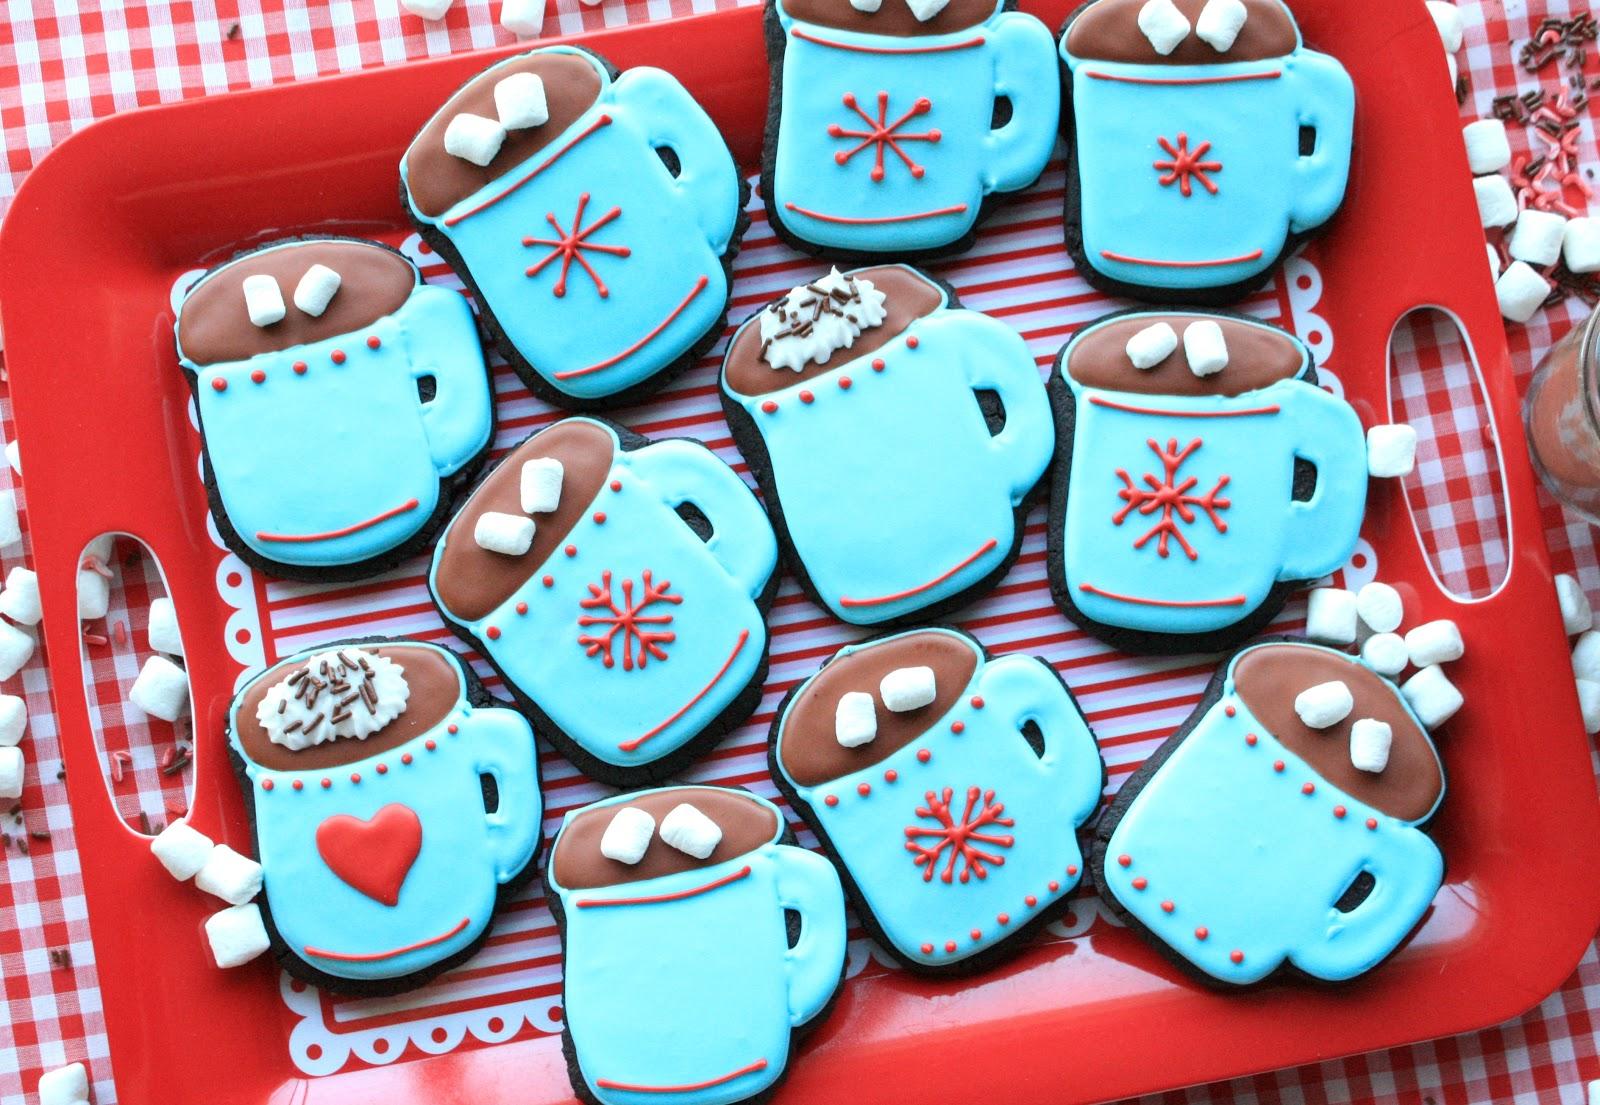 Munchkin Munchies: Cup O' Cocoa Cookies